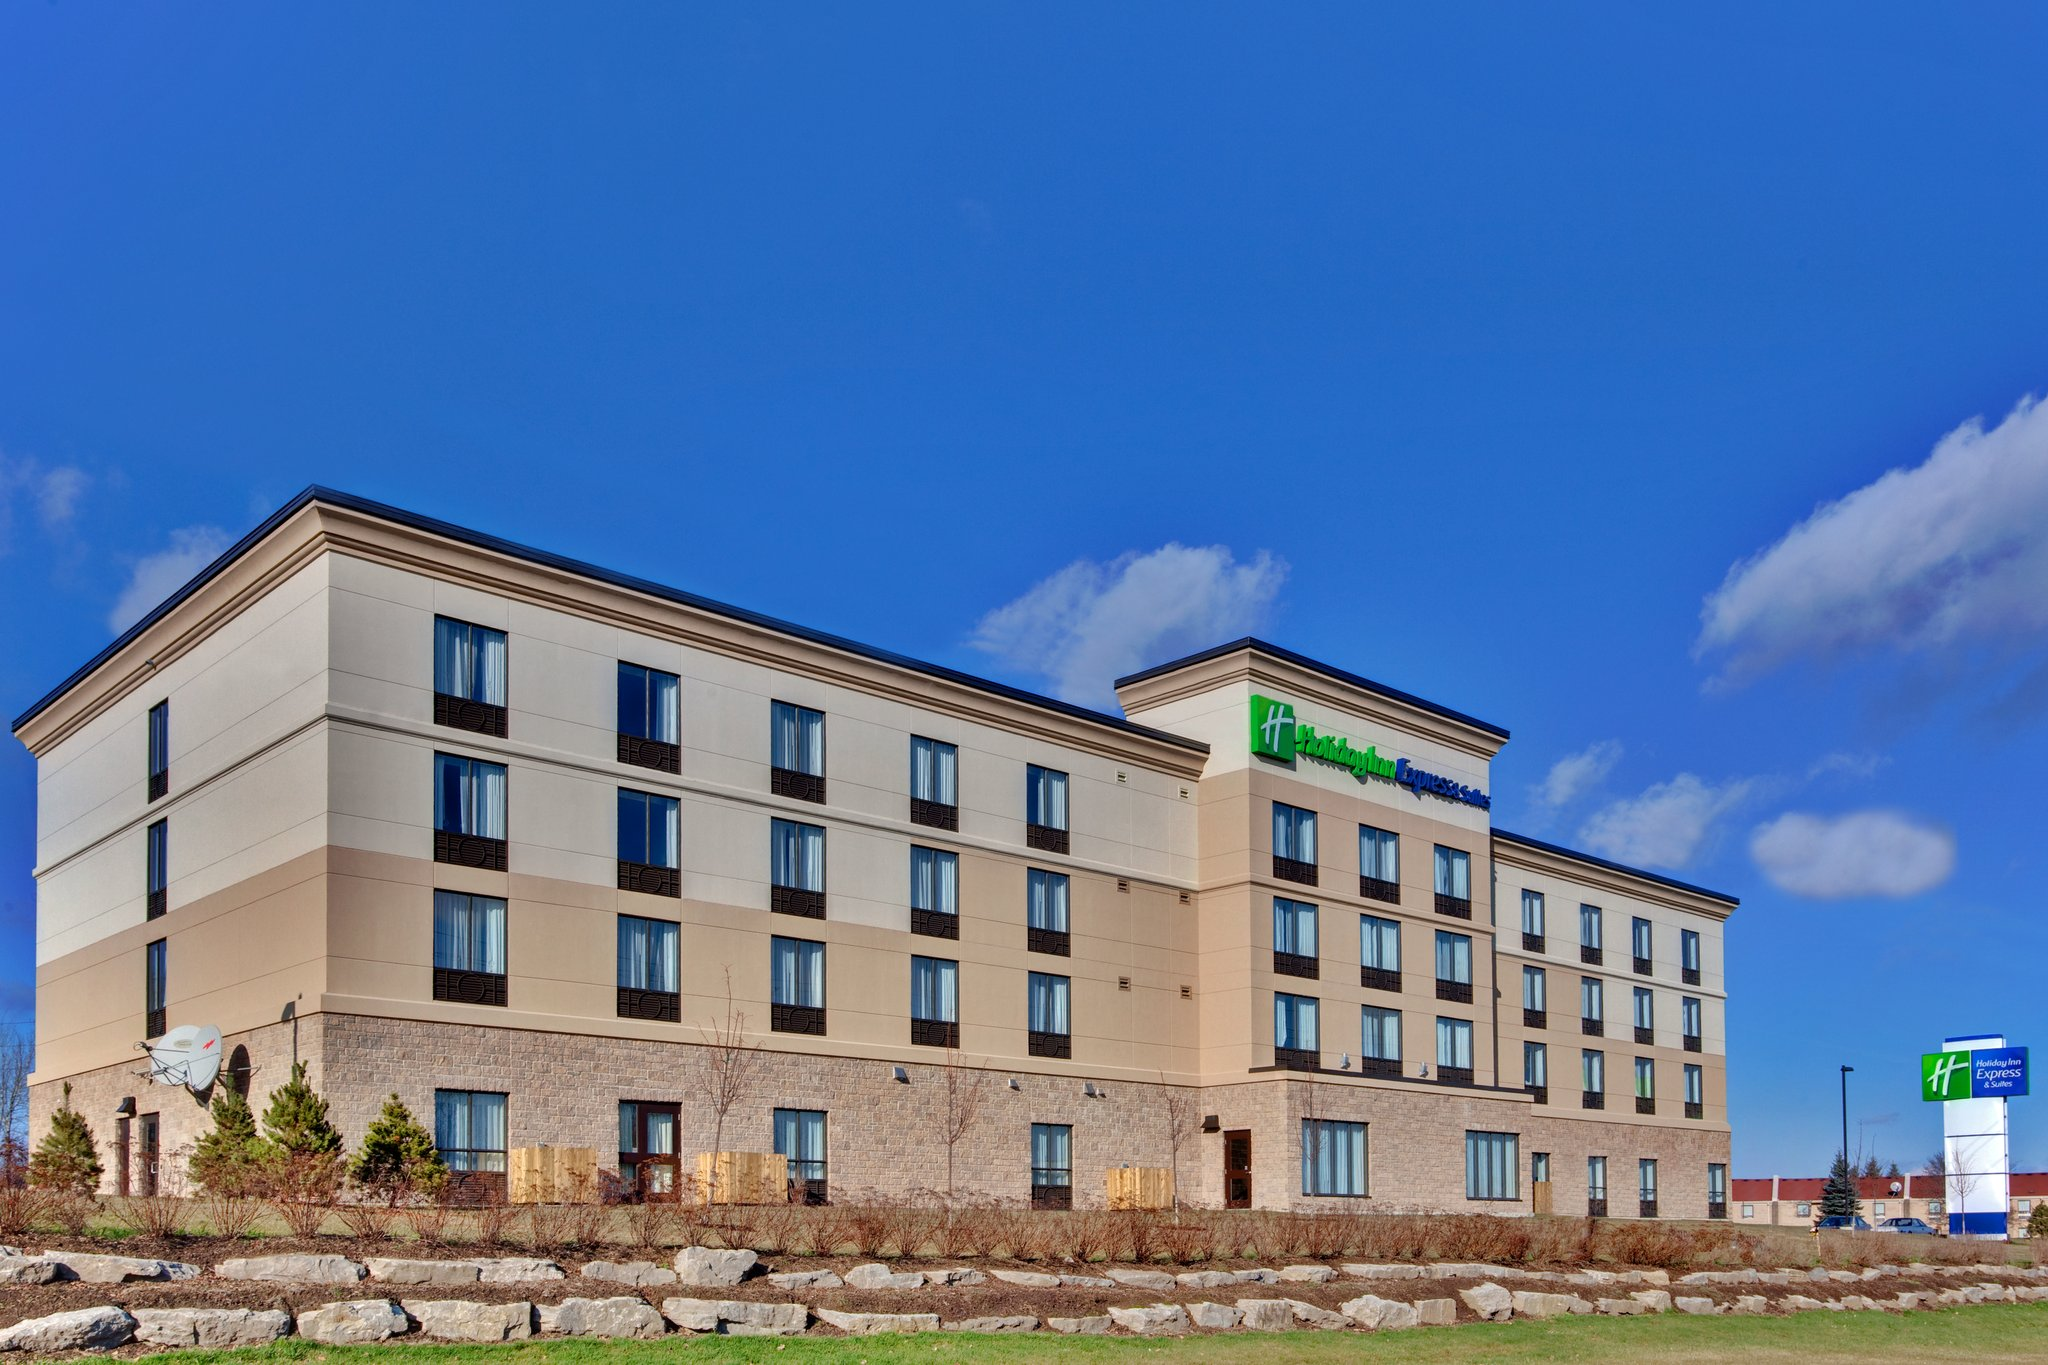 Holiday Inn Express Brockville